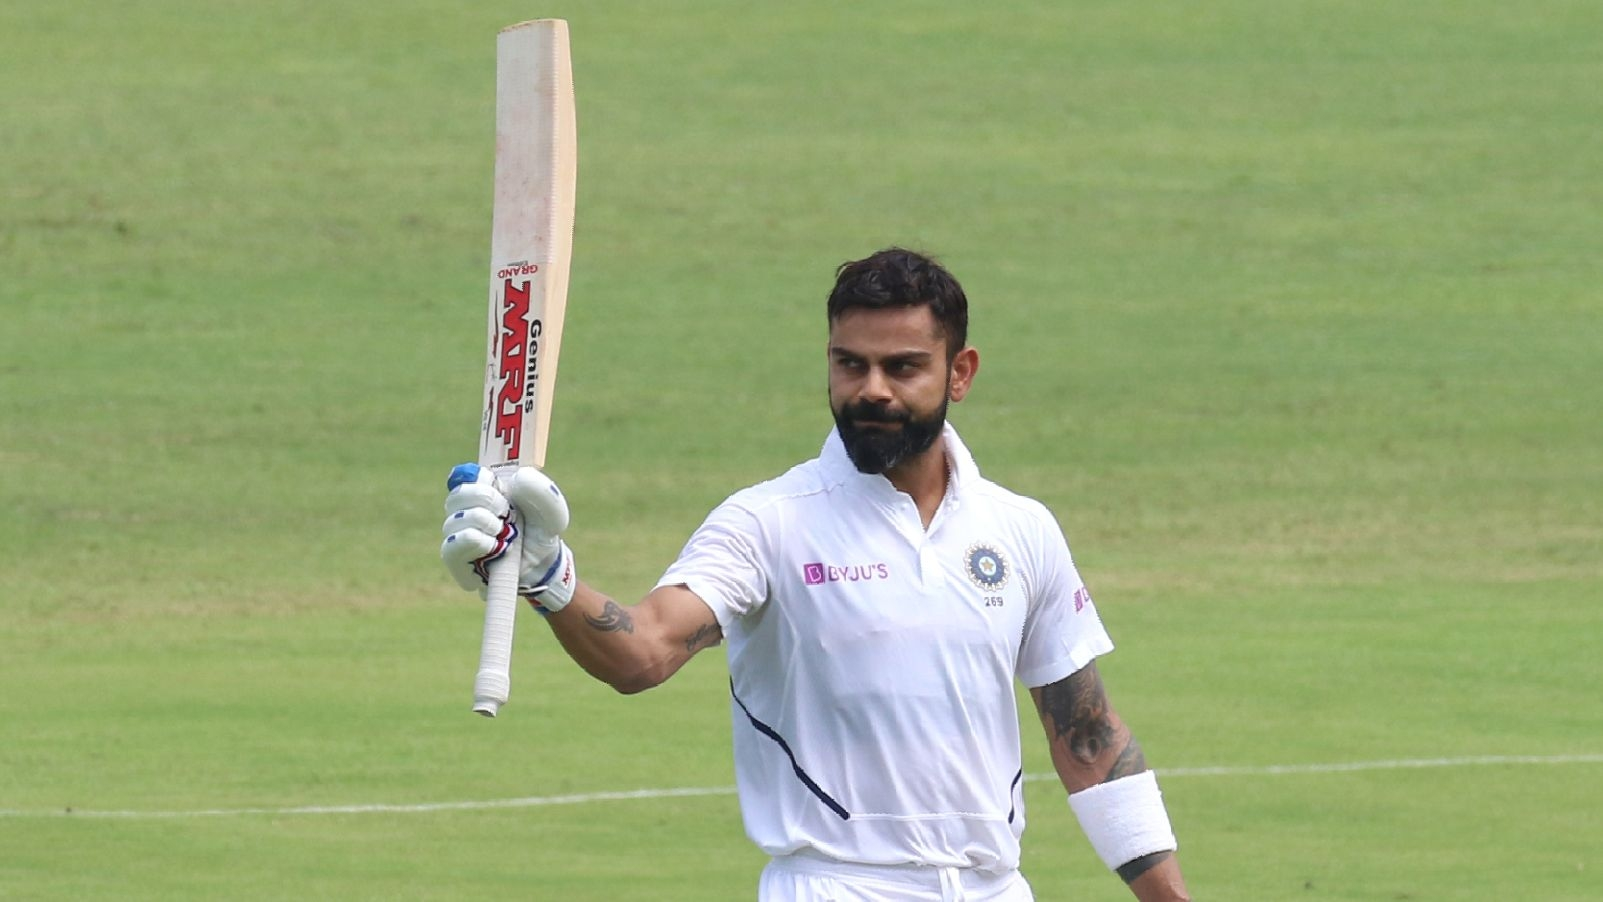 Virat Kohli Smashes Record-Breaking 7th Double Hundred in Tests